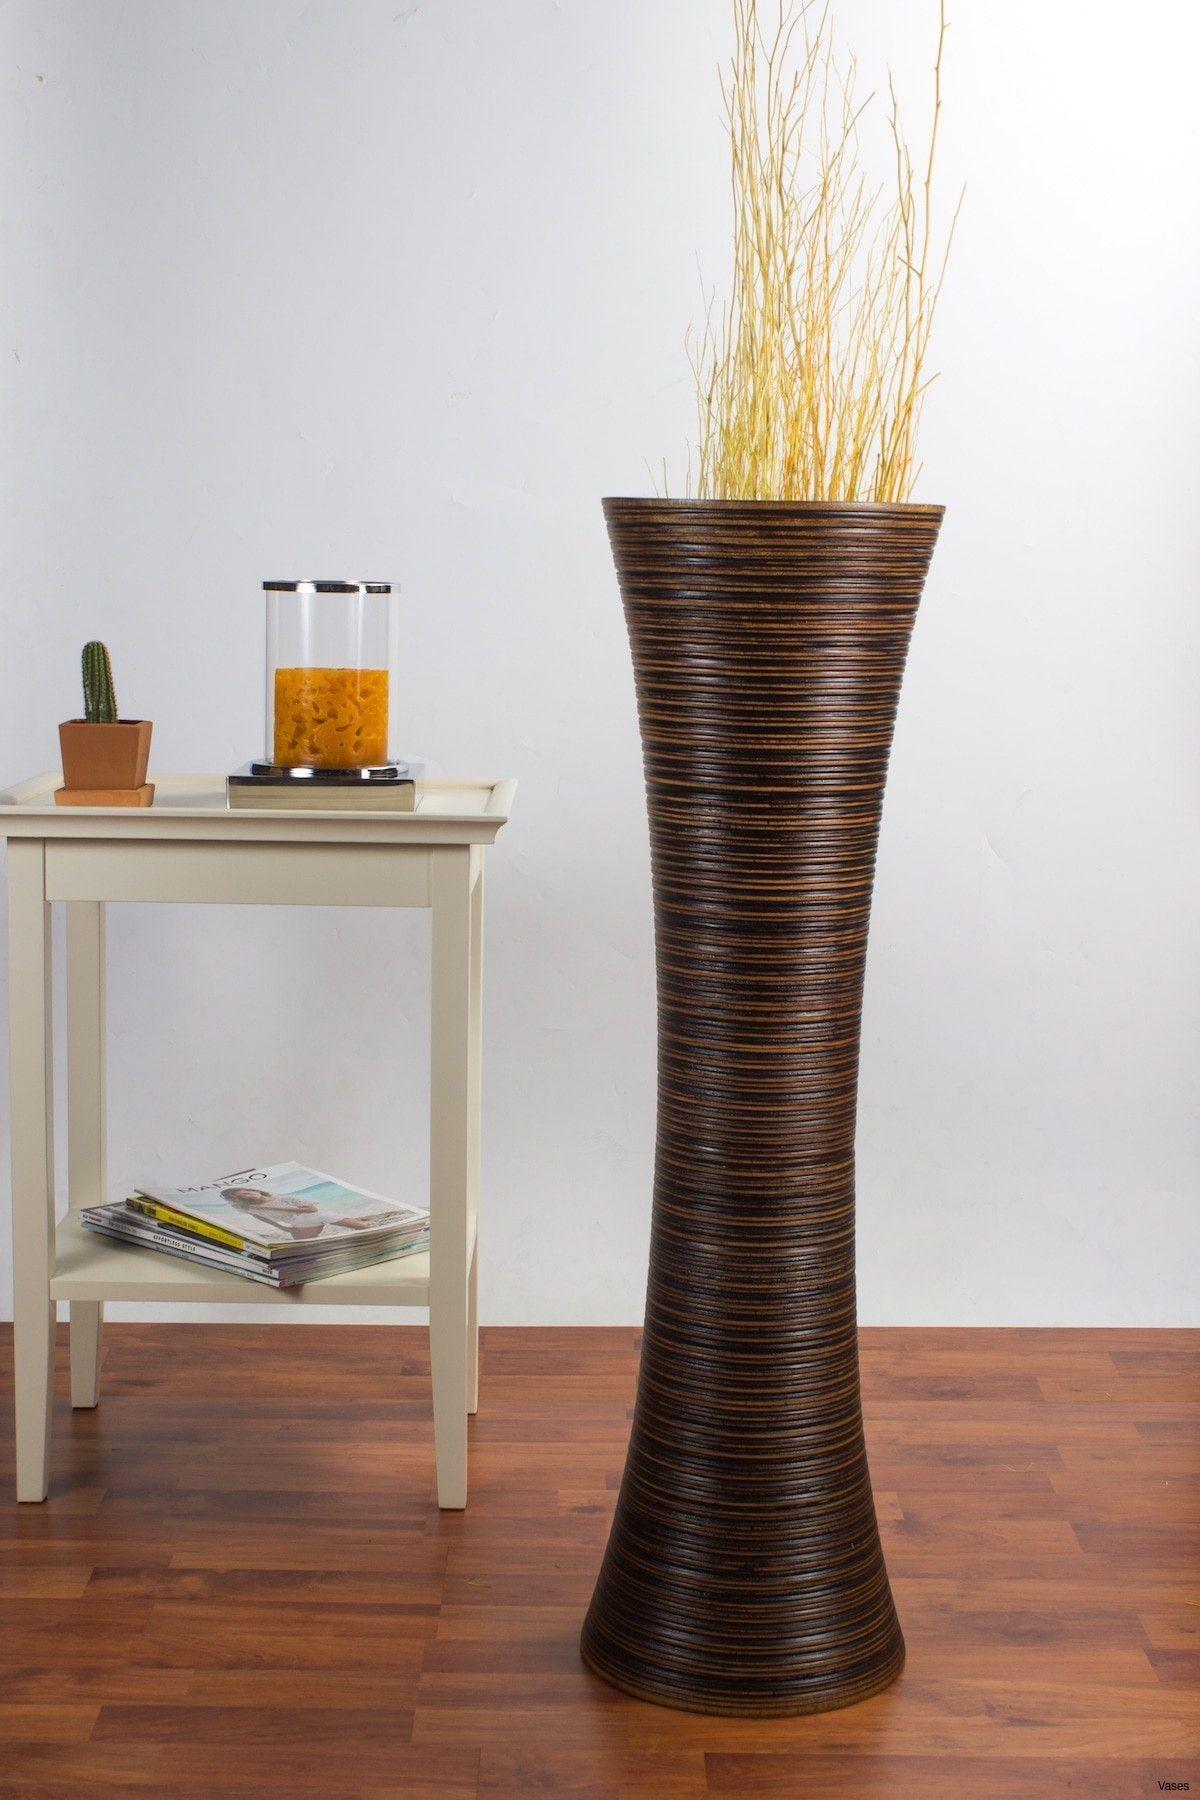 tall plant vase of tall decorative vases luxury decorative floor vases fresh d dkbrw intended for tall decorative vases luxury decorative floor vases fresh d dkbrw 5749 1h vases tall brown i